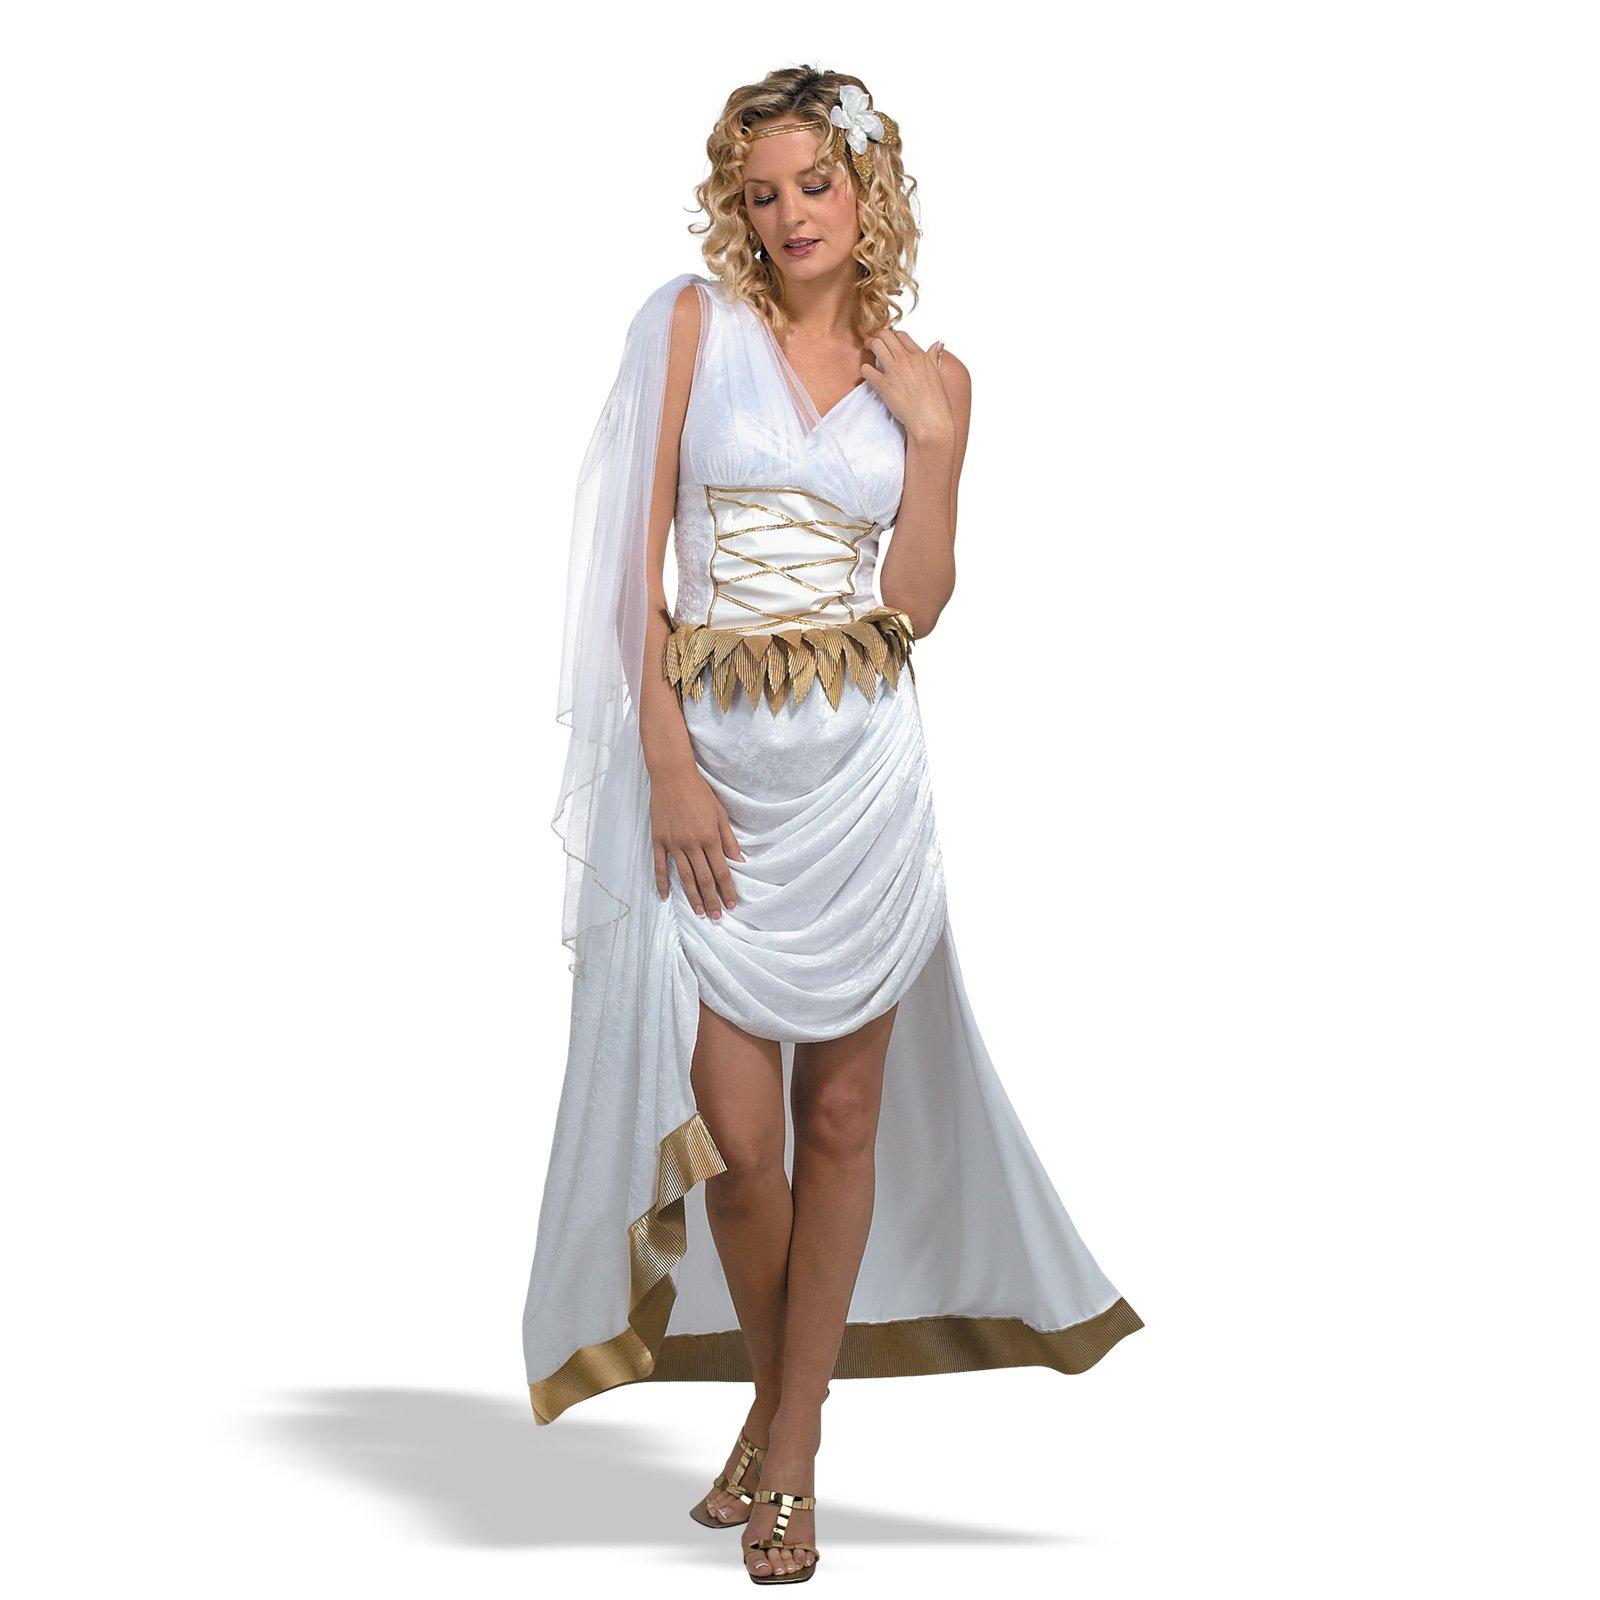 Greek Goddess Clothes | FashionBLAST